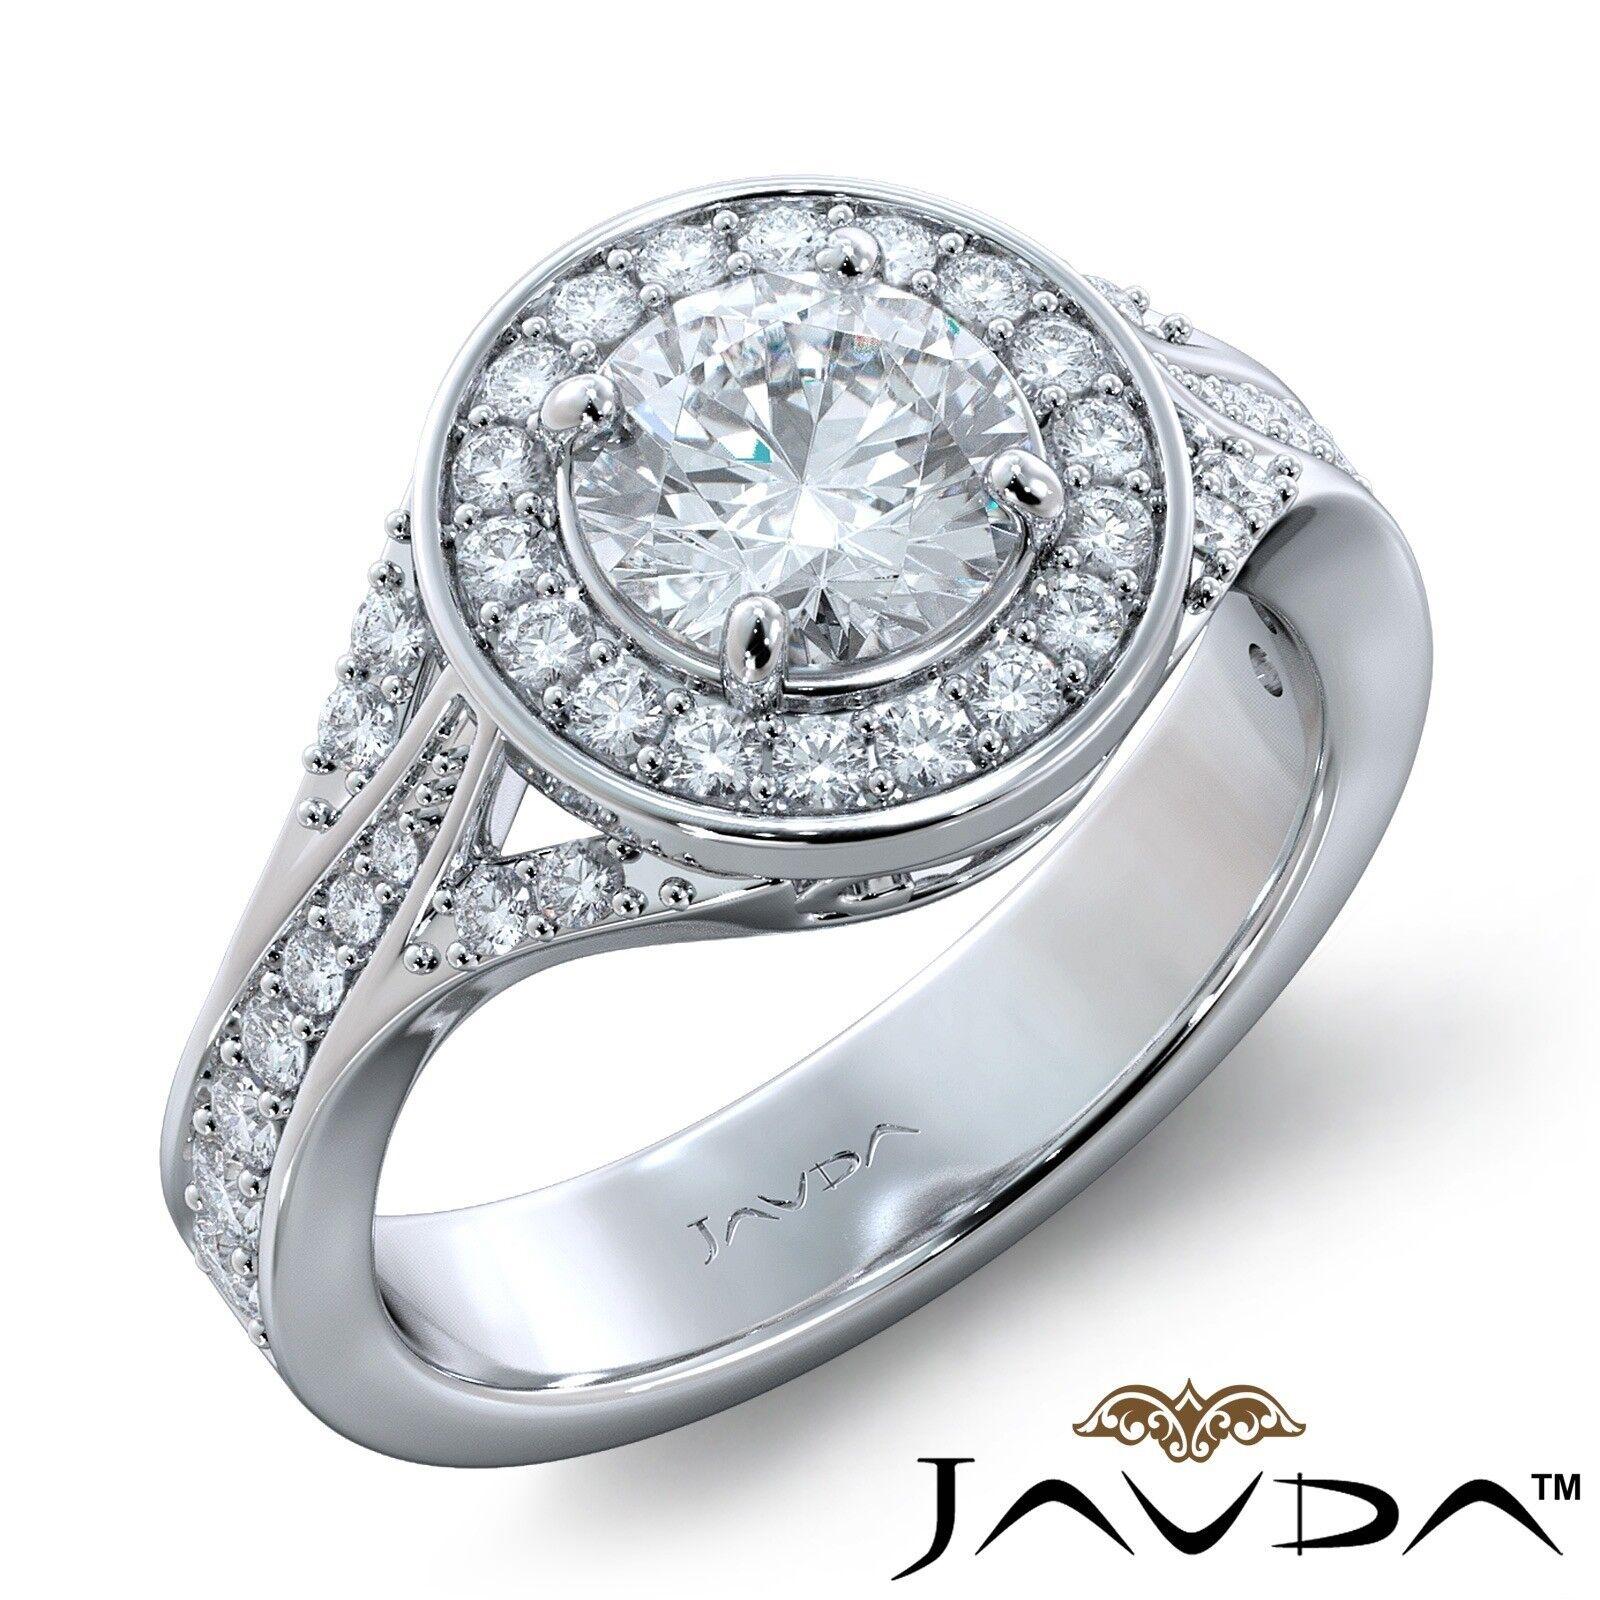 1.95ctw Halo Sidestone Pave Round Diamond Engagement Ring GIA G-VS1 White Gold